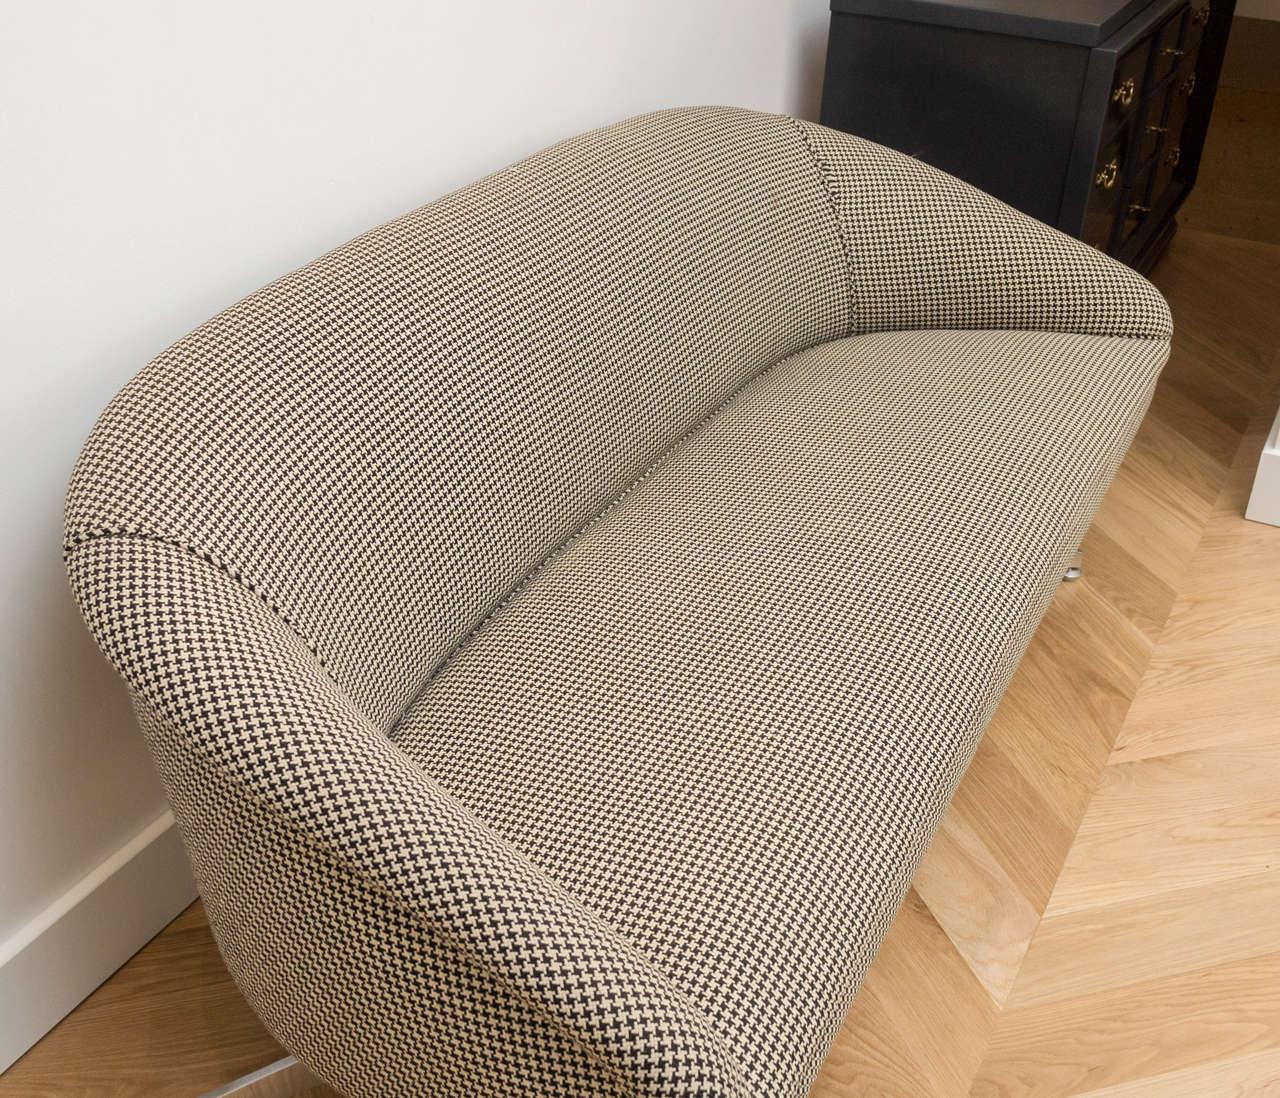 Ward Bennett Sofa with Original Wool Houndstooth Fabric 5